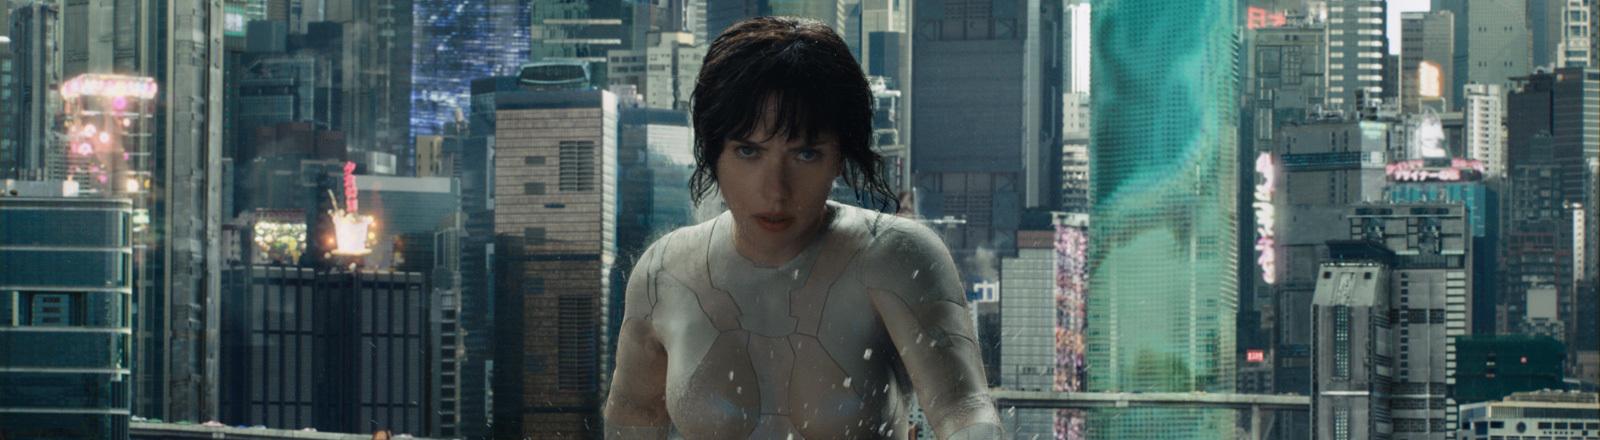 """Ghost in the Shell"" mit Scarlett Johanson"